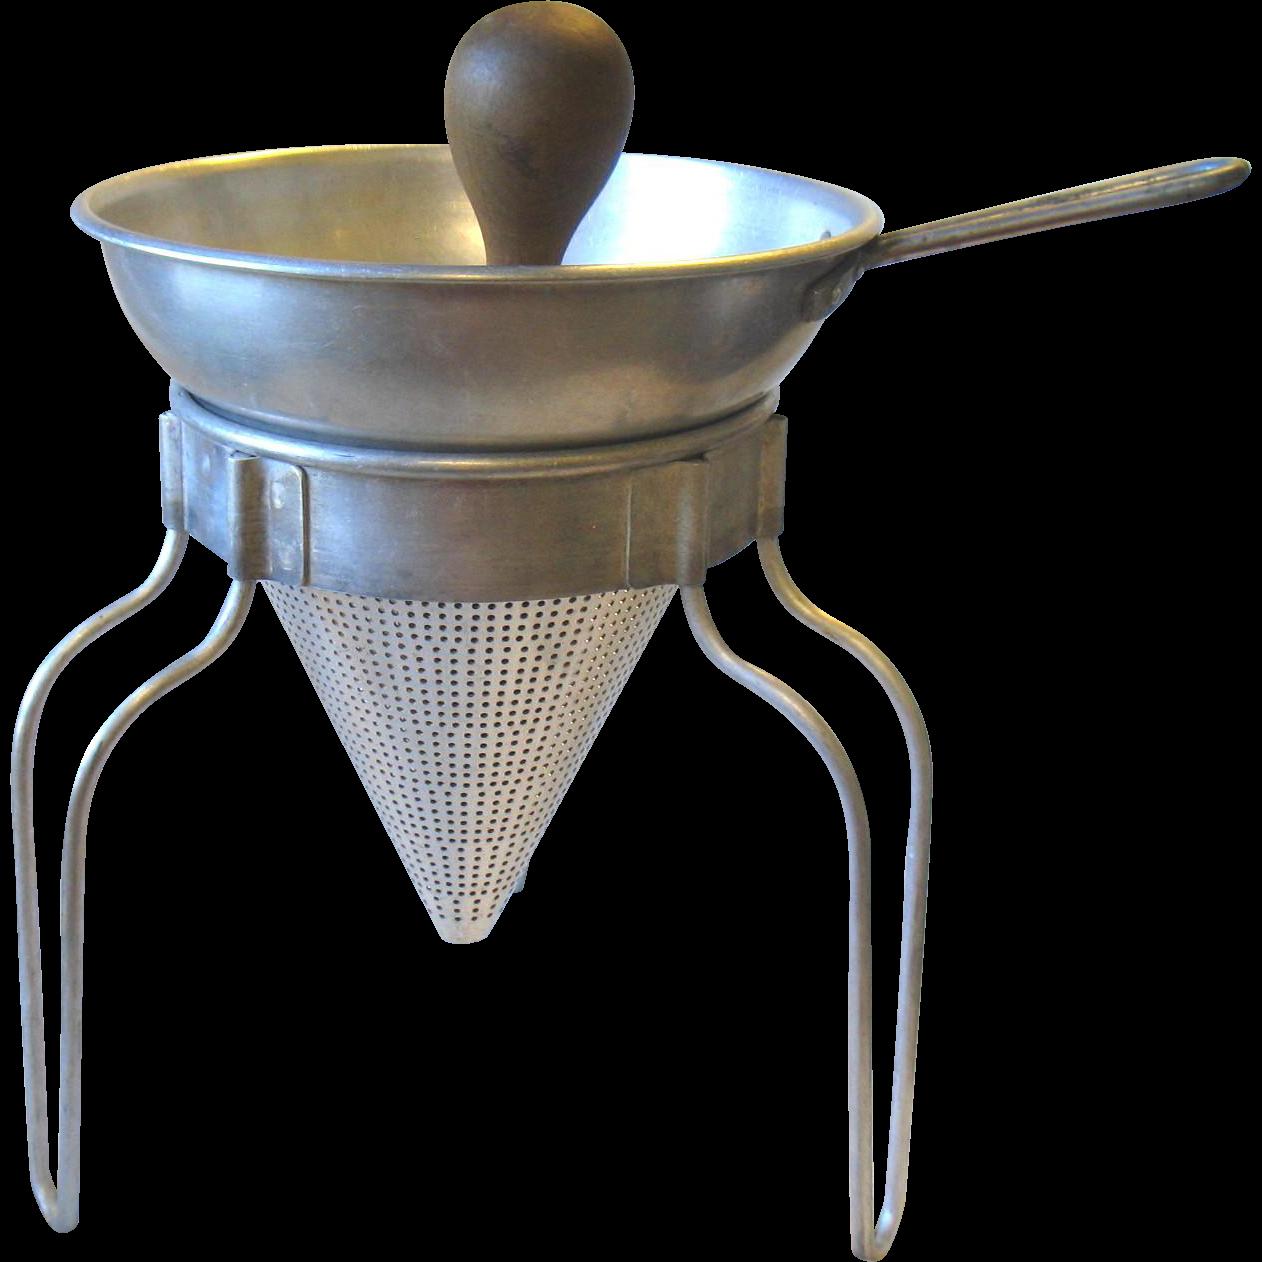 Vintage wear ever aluminum food sieve colander strainer for Aluminum cuisine